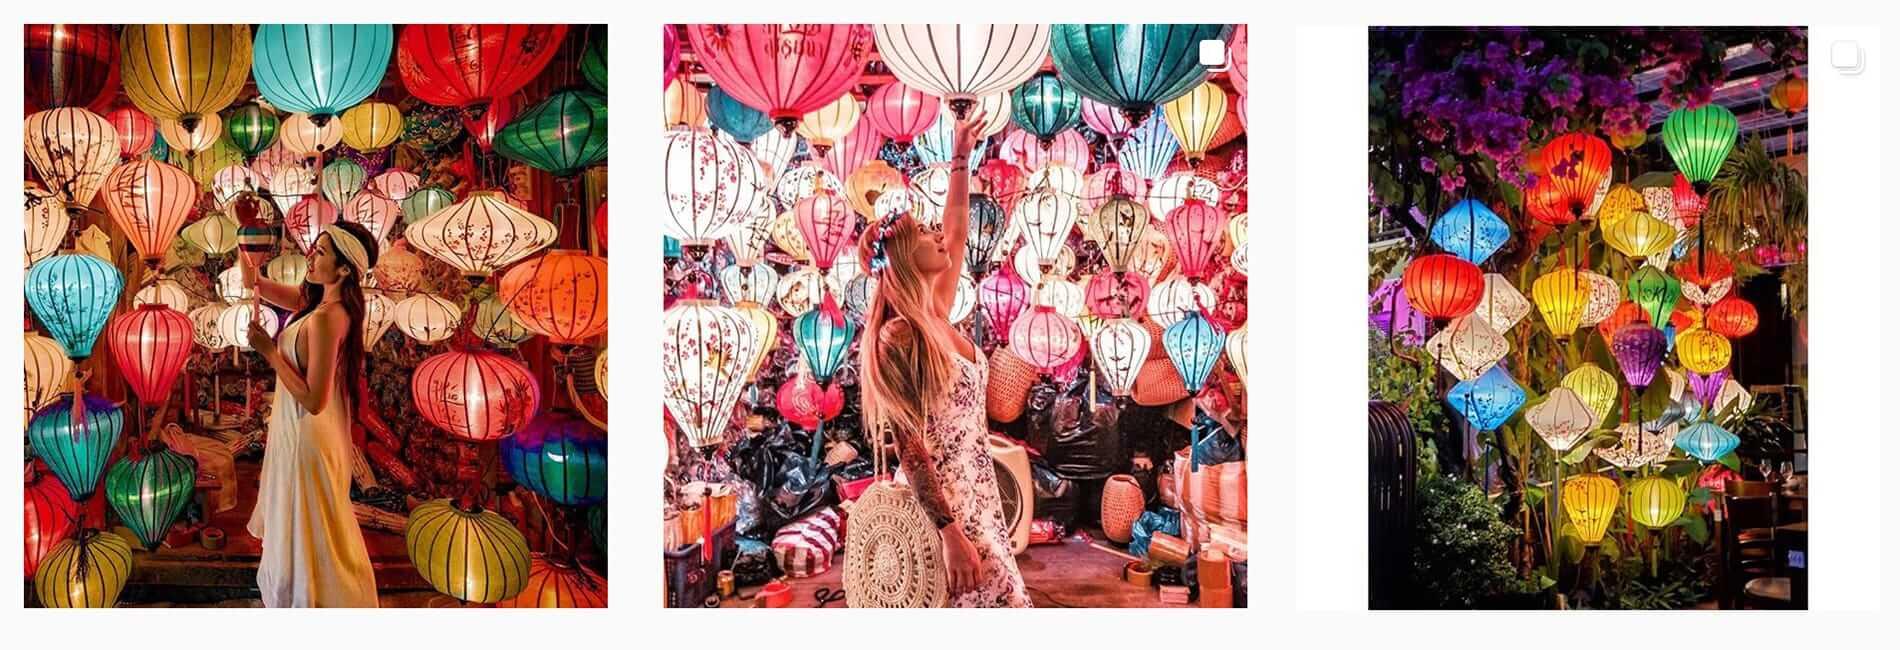 Hoi An lanterns on Instagram